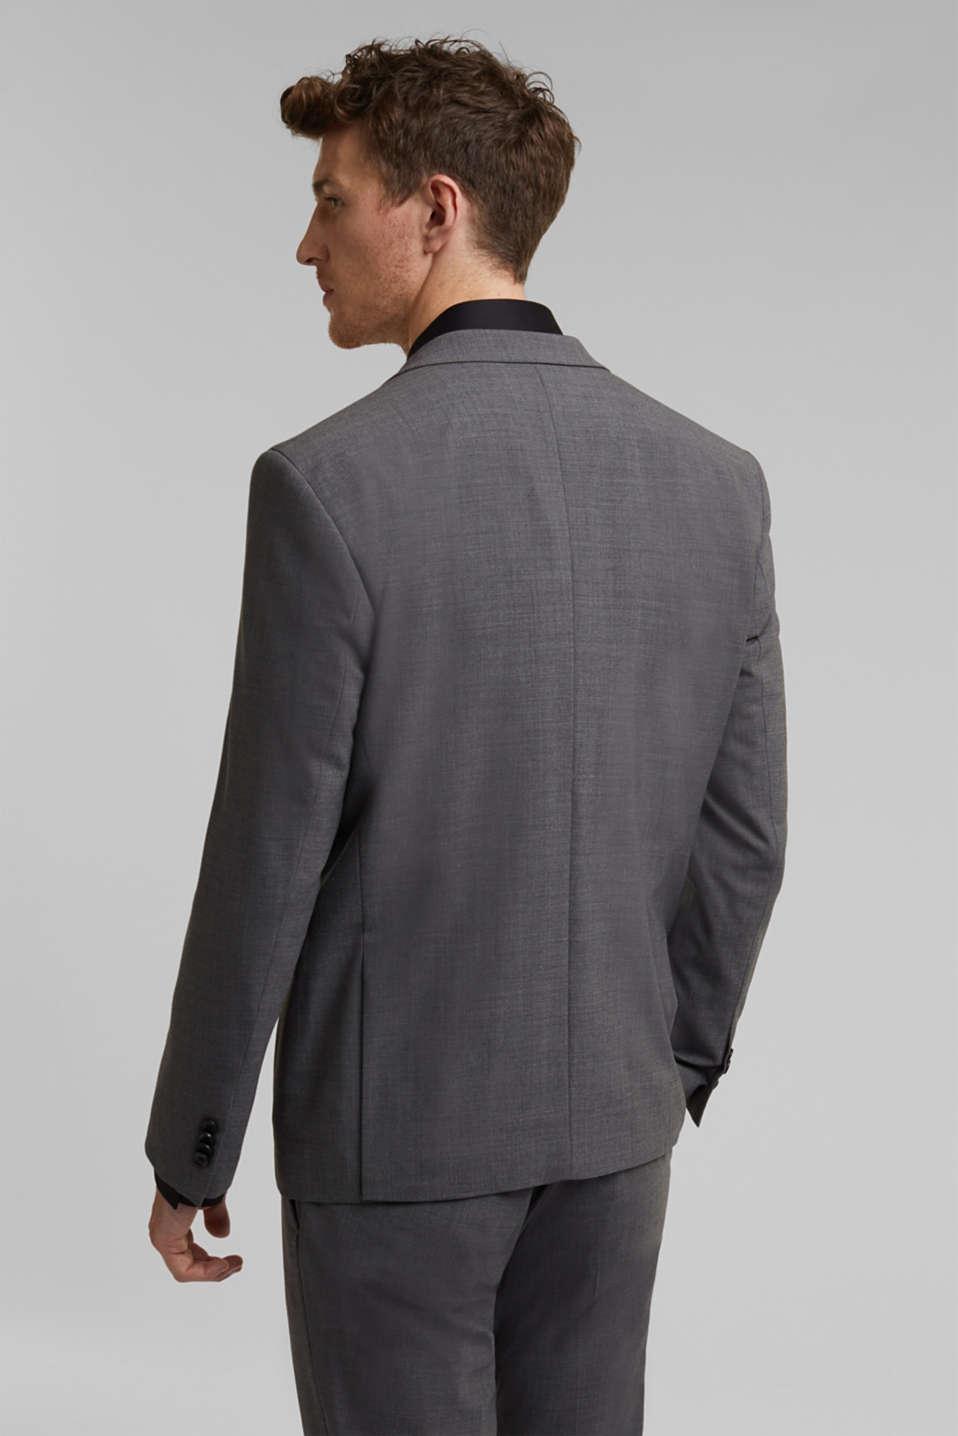 ACTIVE SUIT tailored jacket, wool blend, DARK GREY 5, detail image number 3